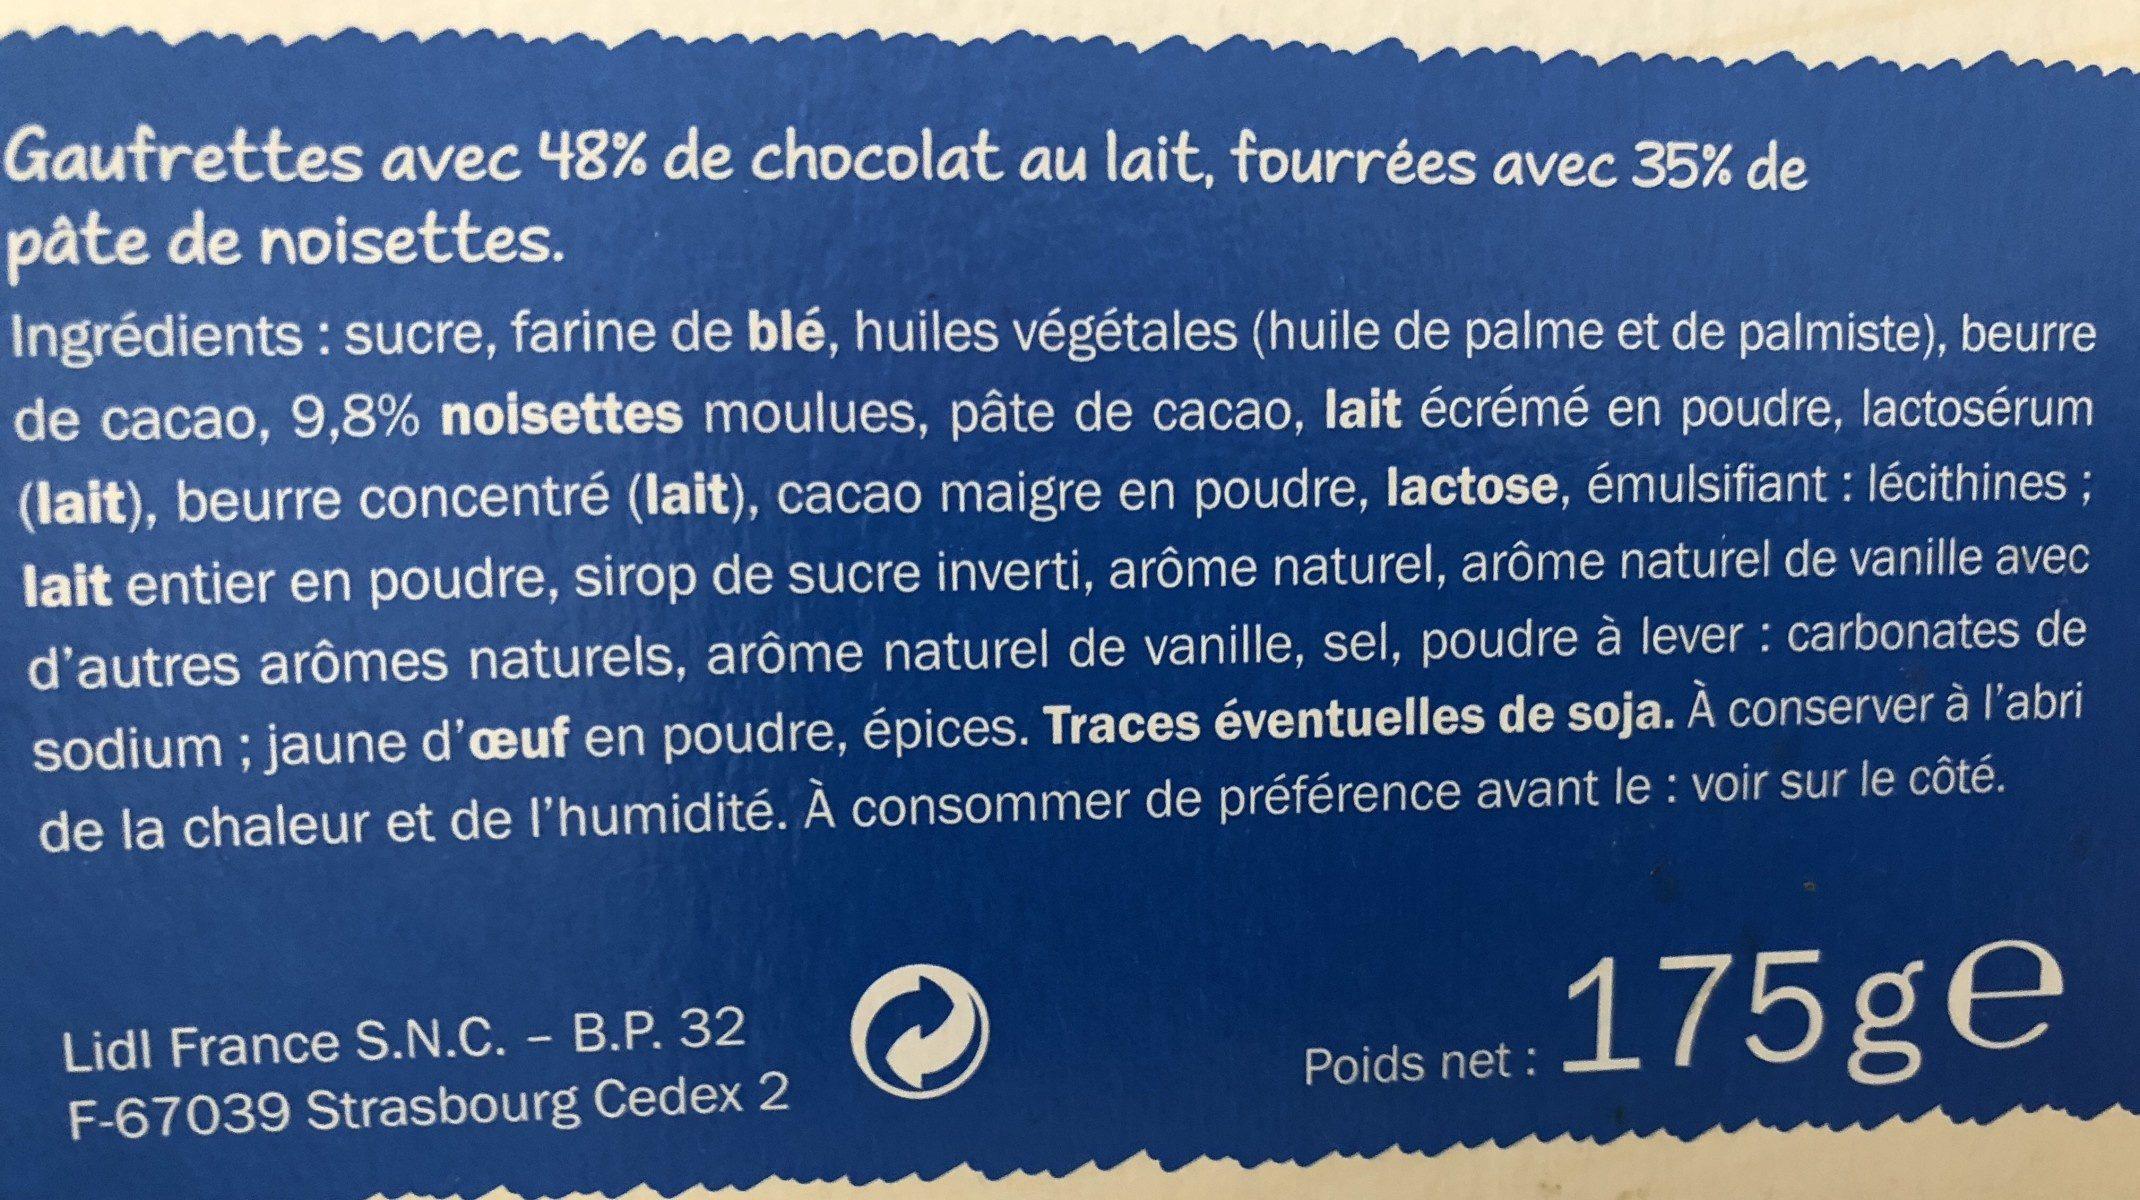 Gaufrettes croustillante - Ingredients - fr